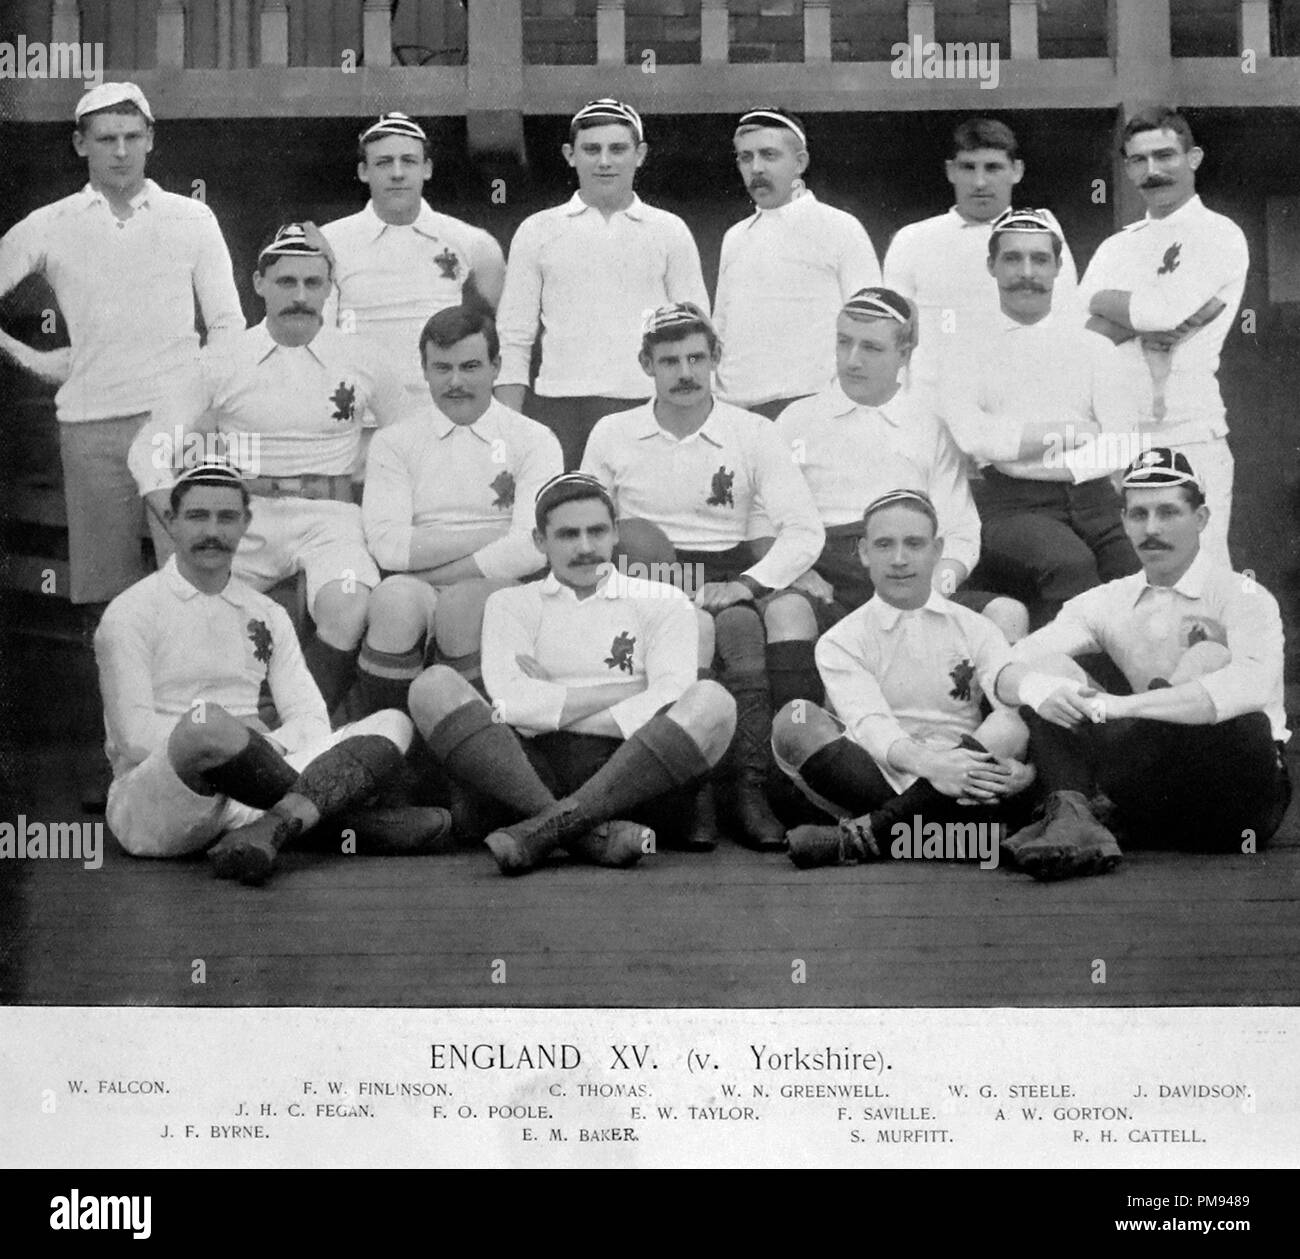 England XV Rugby Team im Jahr 1890 Stockfoto